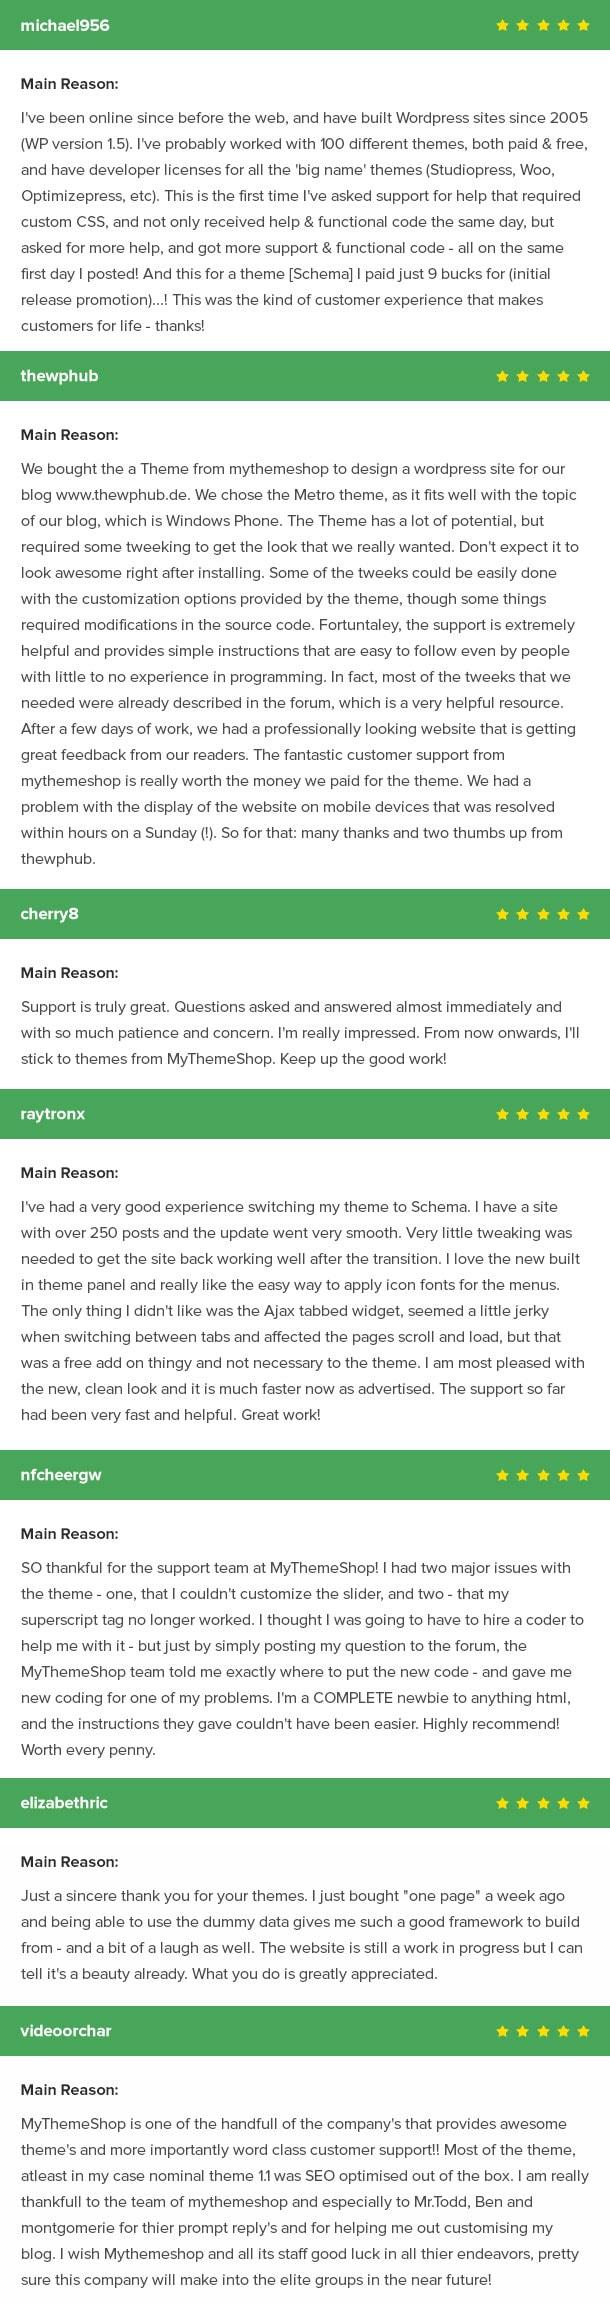 OnePage Testimonials